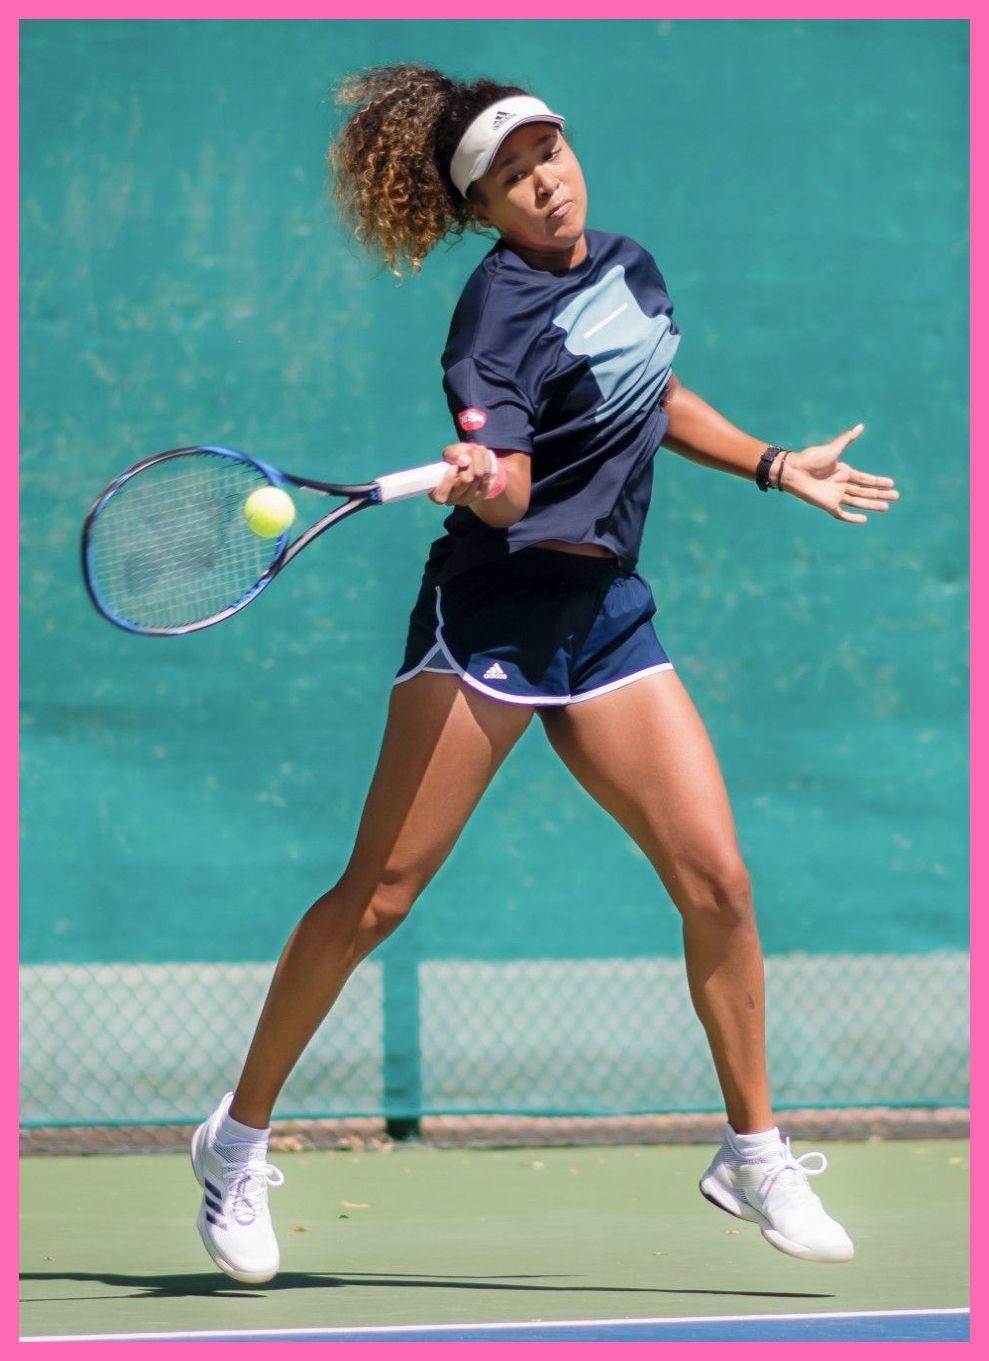 World Top Tennis Player Naomi Osaka Wins Laureus Breakthrough Prize Tennis Outfit Women Tennis Players Female Tennis Clothes Tennis Players